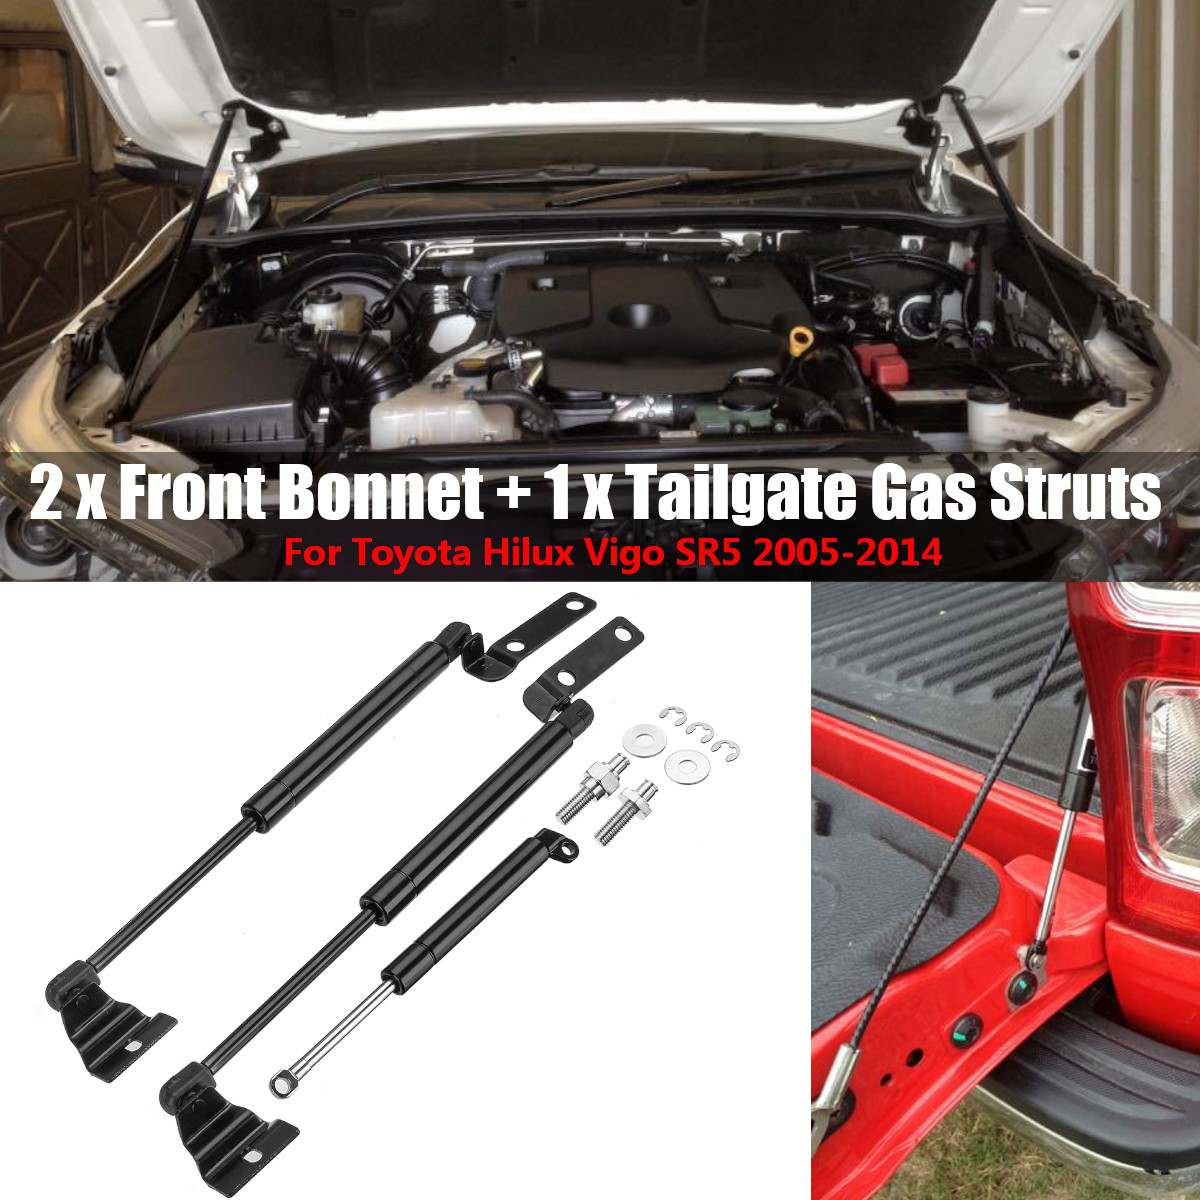 3 adet ön Bonnet + bagaj kapağı gaz lifti desteği Struts Toyota Hilux Vigo için SR5 2005 2006 2007 2008 2009 2010 2011 2012 2013 2014